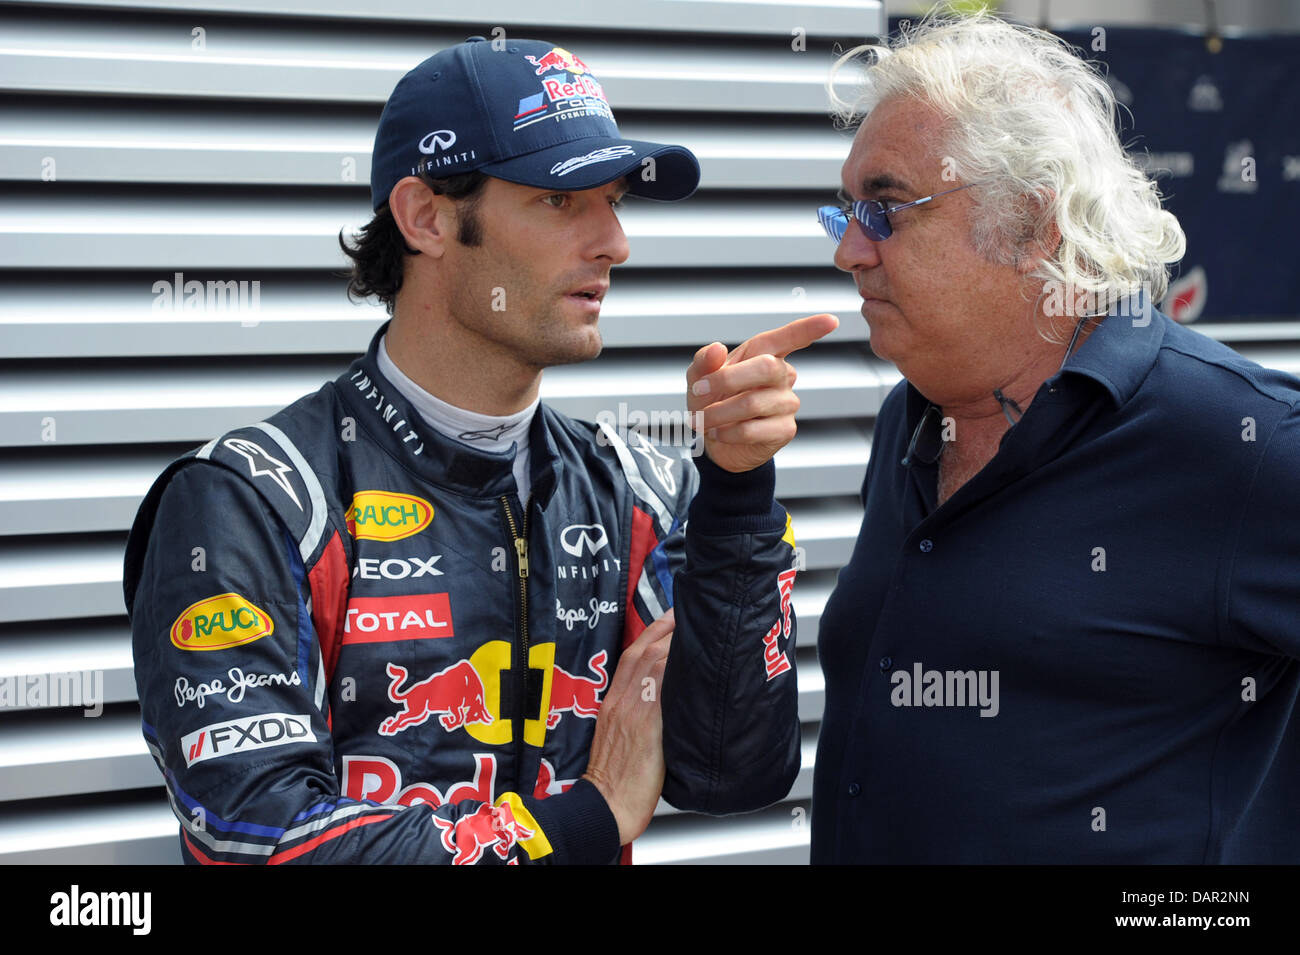 45dd0bbf6c9 Australian Formula One driver Mark Webber (L) of Red Bull chats with  Italian Flavio Briatore